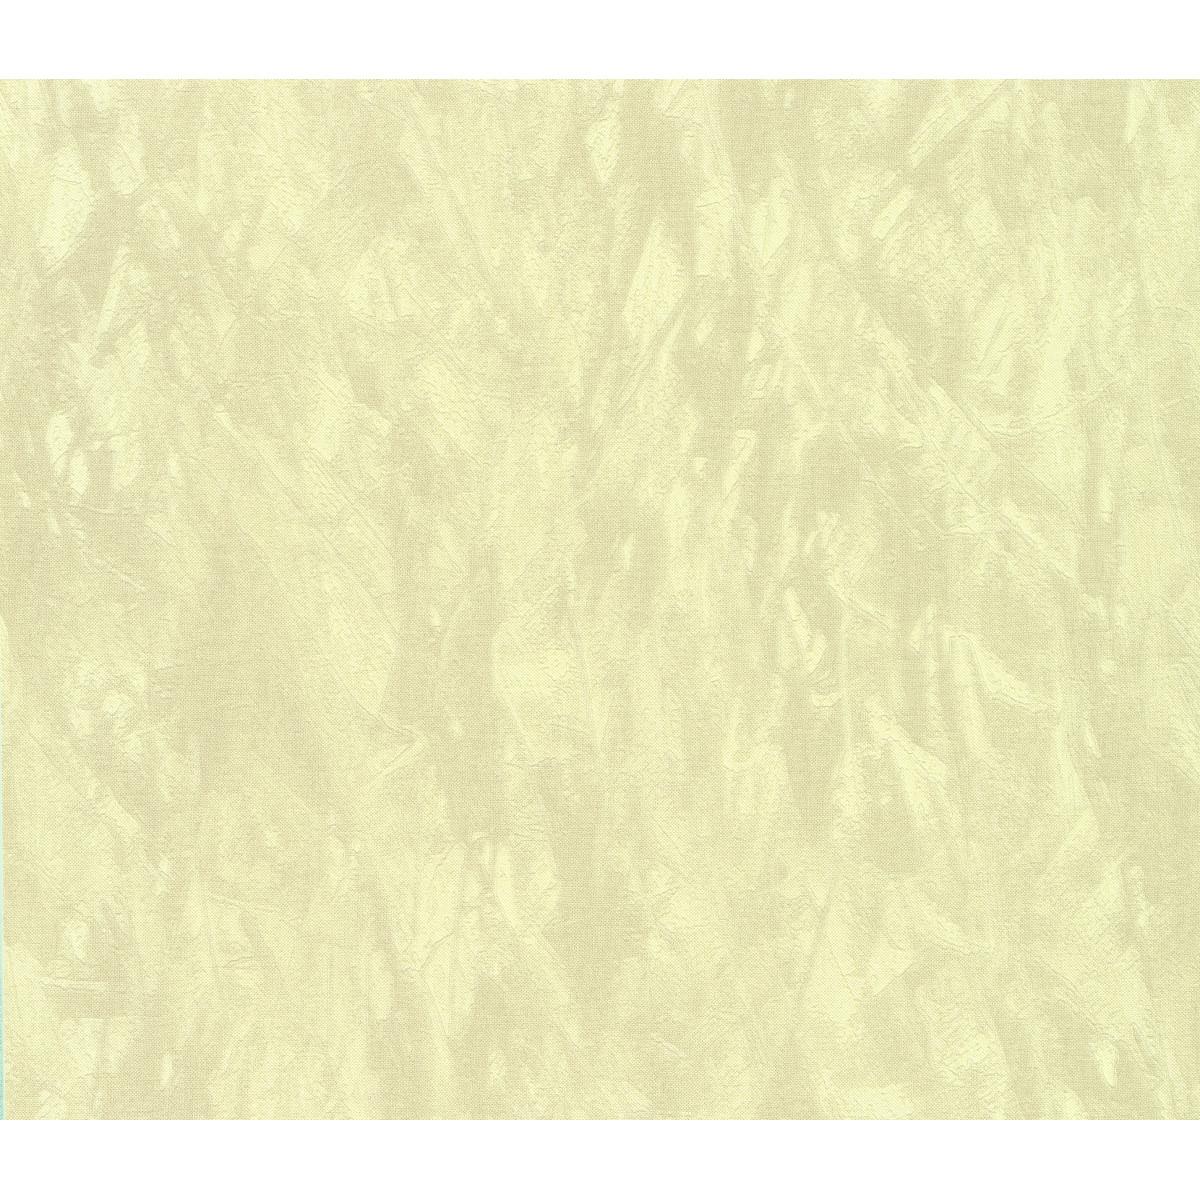 Обои флизелиновые Limonta Italian Wall Couture VETIVER желтые 1.06 м 44402